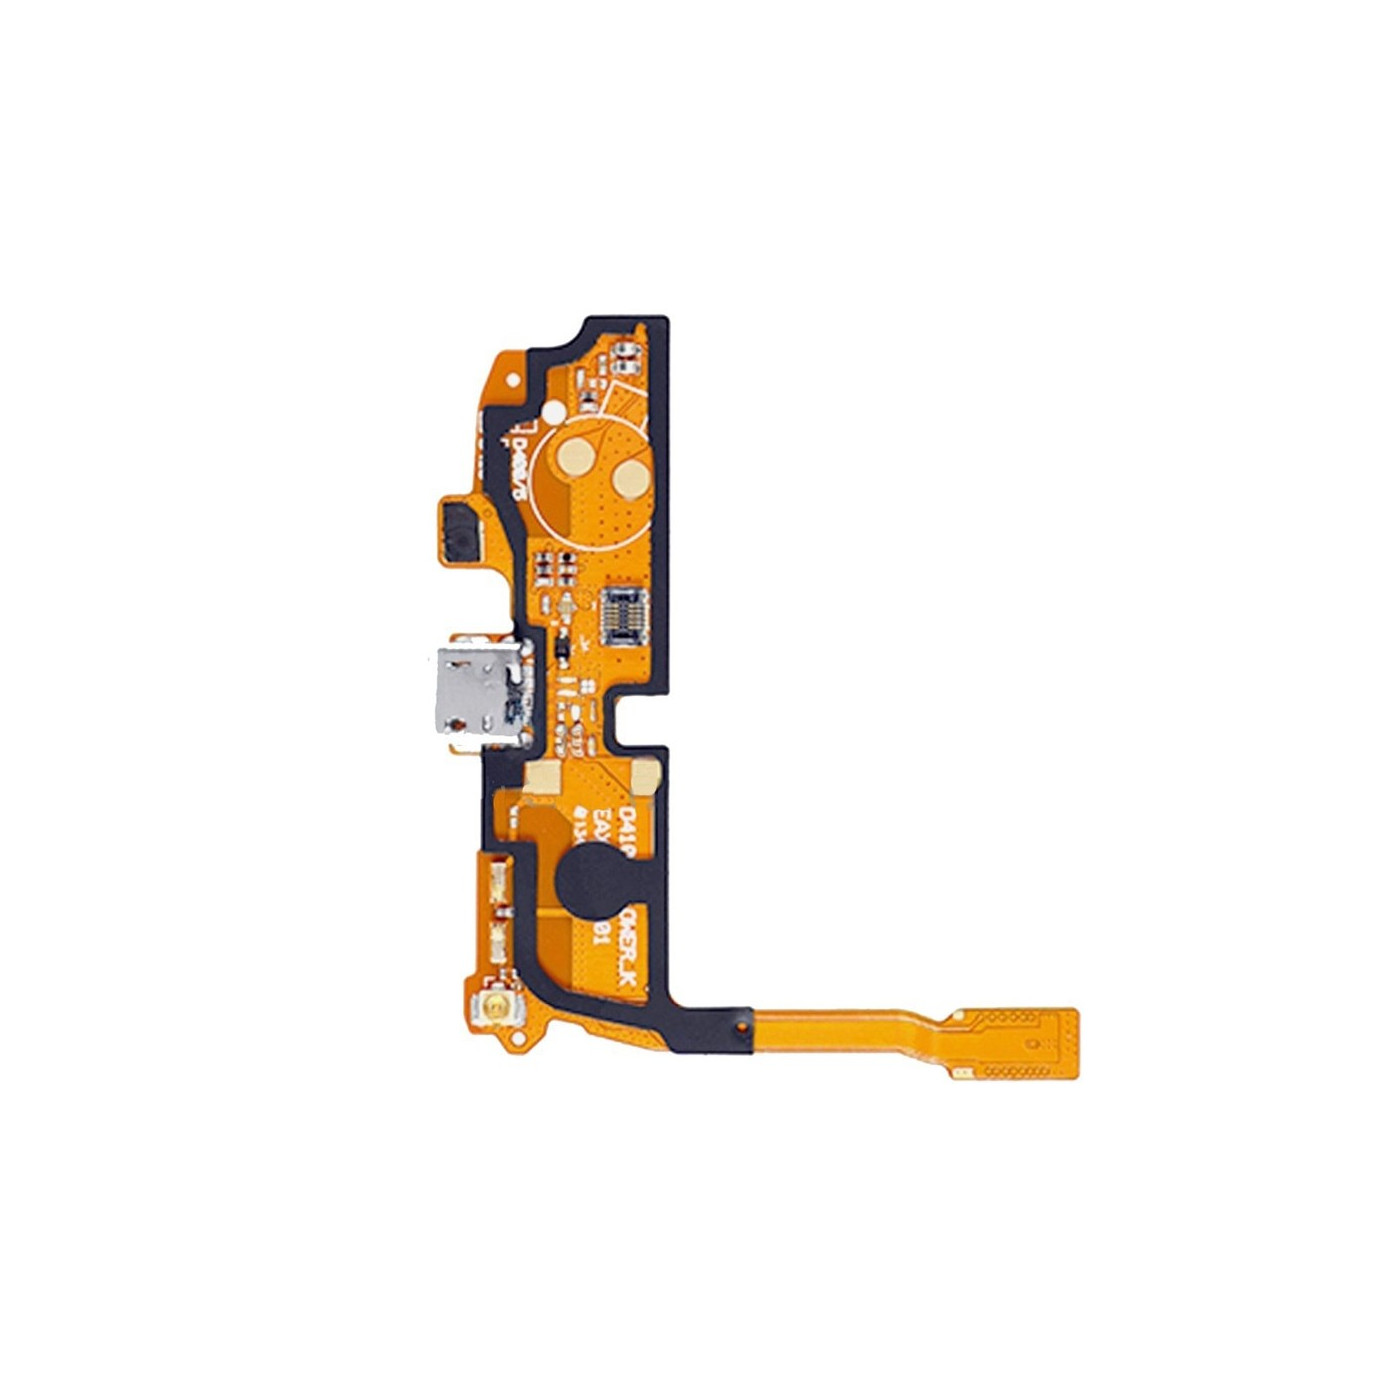 Flat Flex Ladestecker für LG Optimus L90 D405 Ladestation